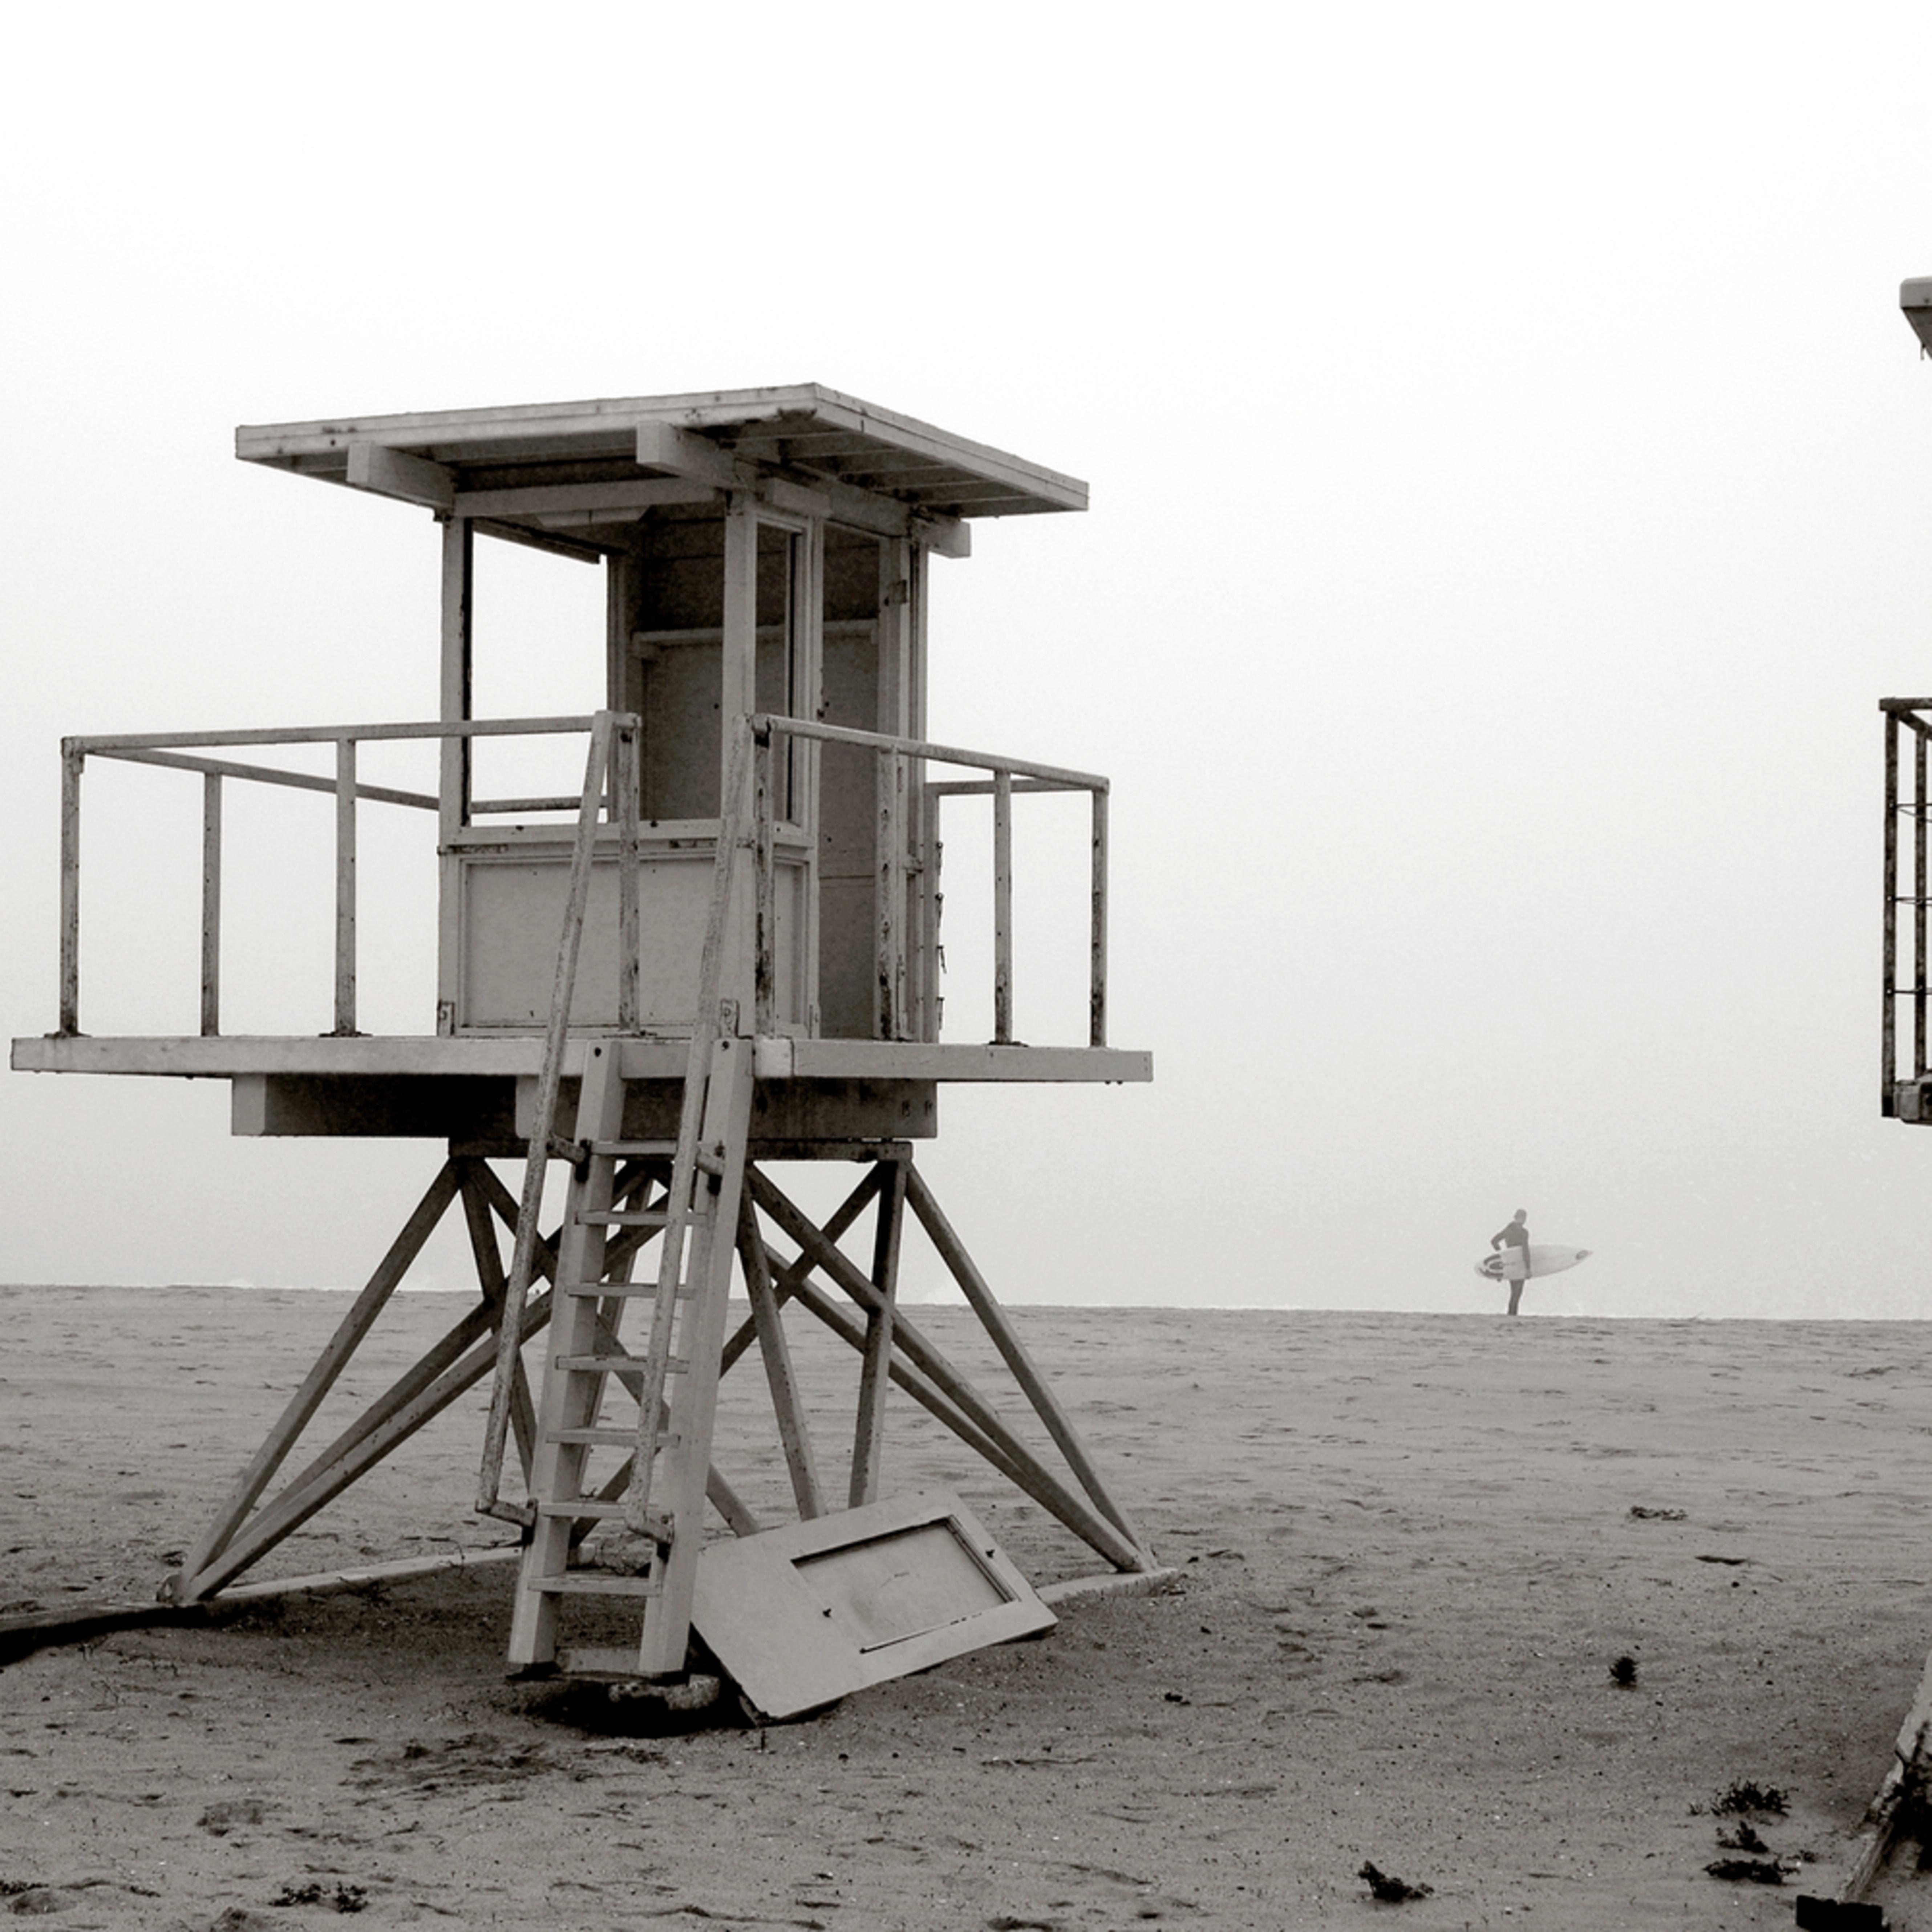 Huntington beach dilapidated vintage lifeguard stand california nrfqax